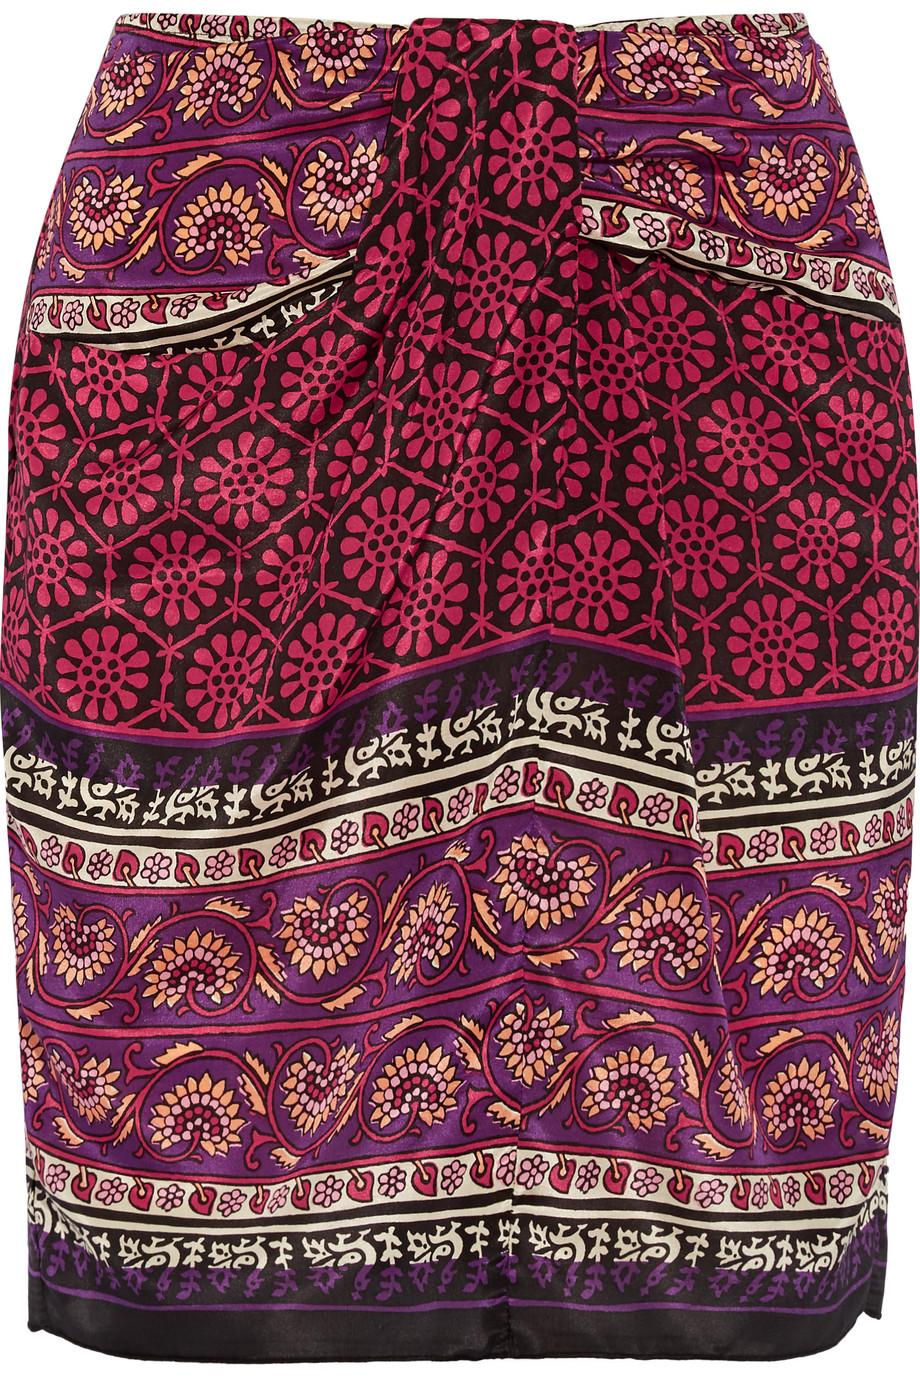 Anna Sui Printed Silk and Cotton-Blend Mini Skirt, Claret/Purple, Women's, Size: 0